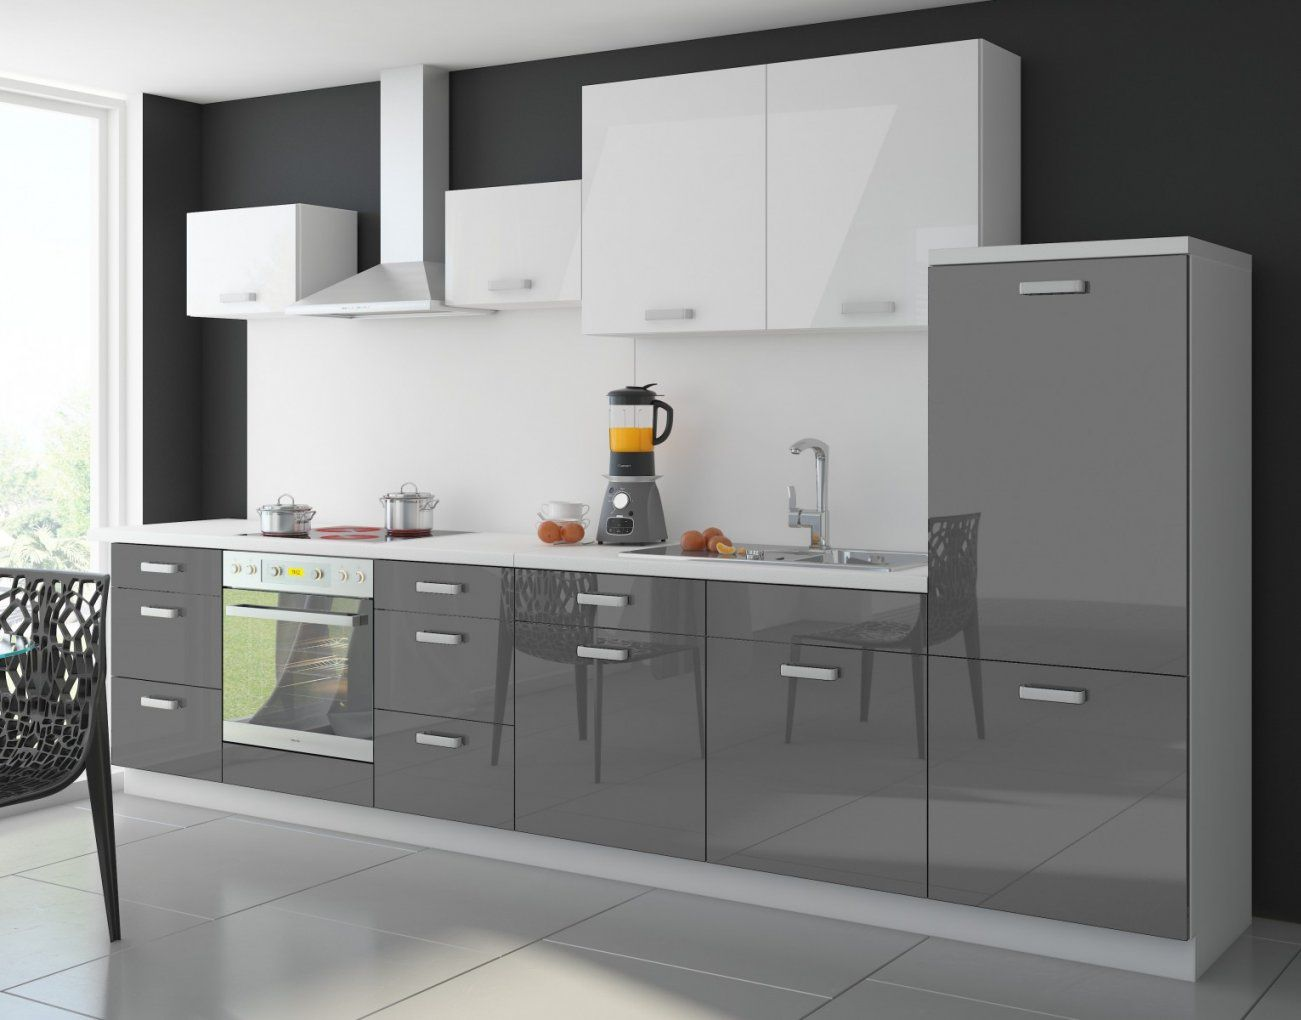 Kuche  Arbeitsplatte Küche Günstig Obi Design Arbeitsplatte Küche von Küchenzeile Weiß Hochglanz Günstig Bild